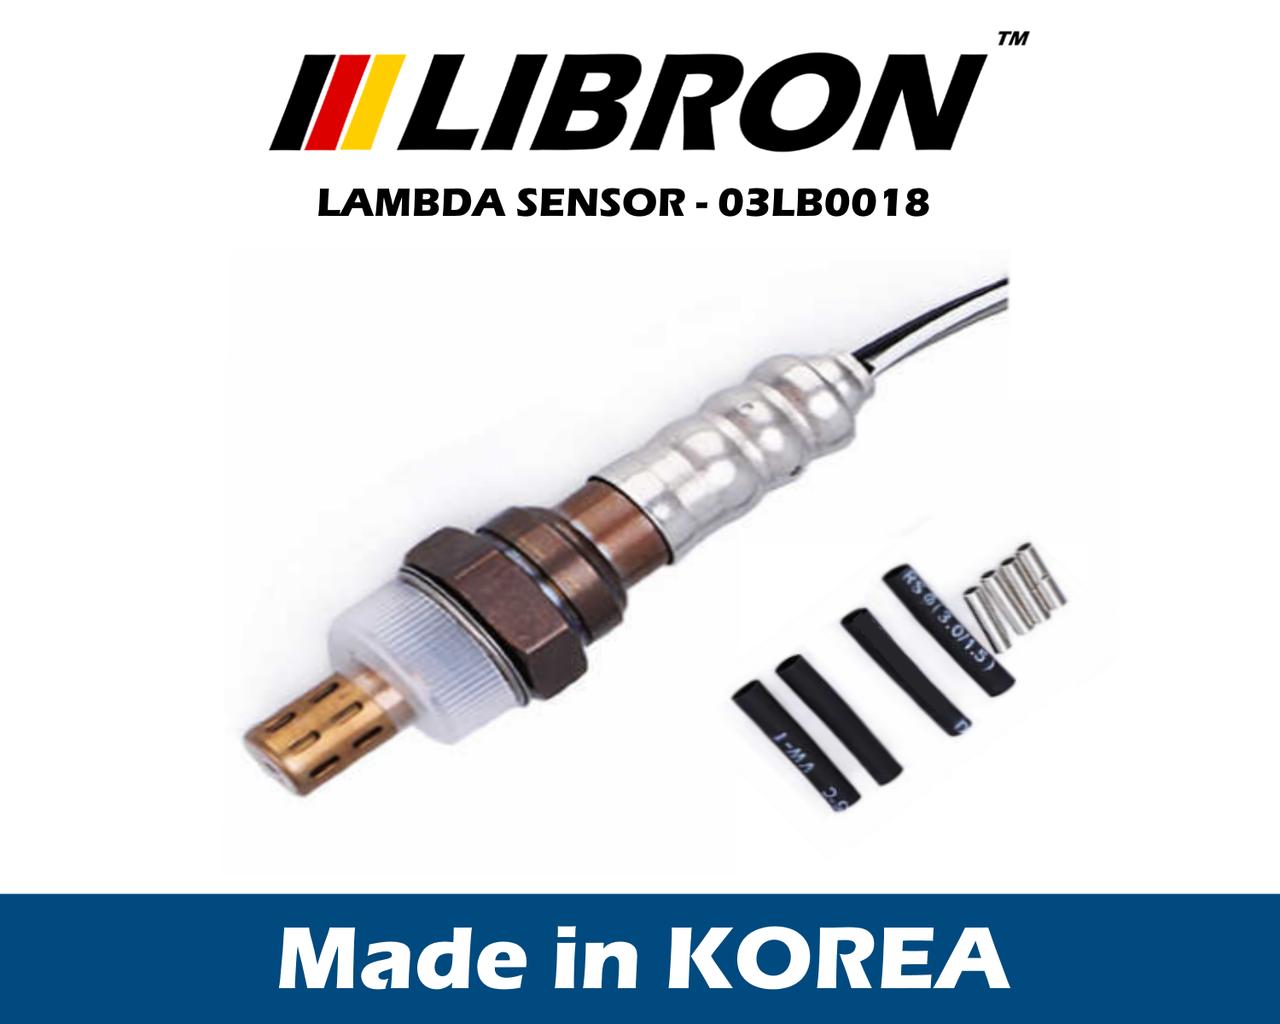 Лямбда зонд Libron 03LB0018 - Renault CLIO IV Grandtour (KH_)